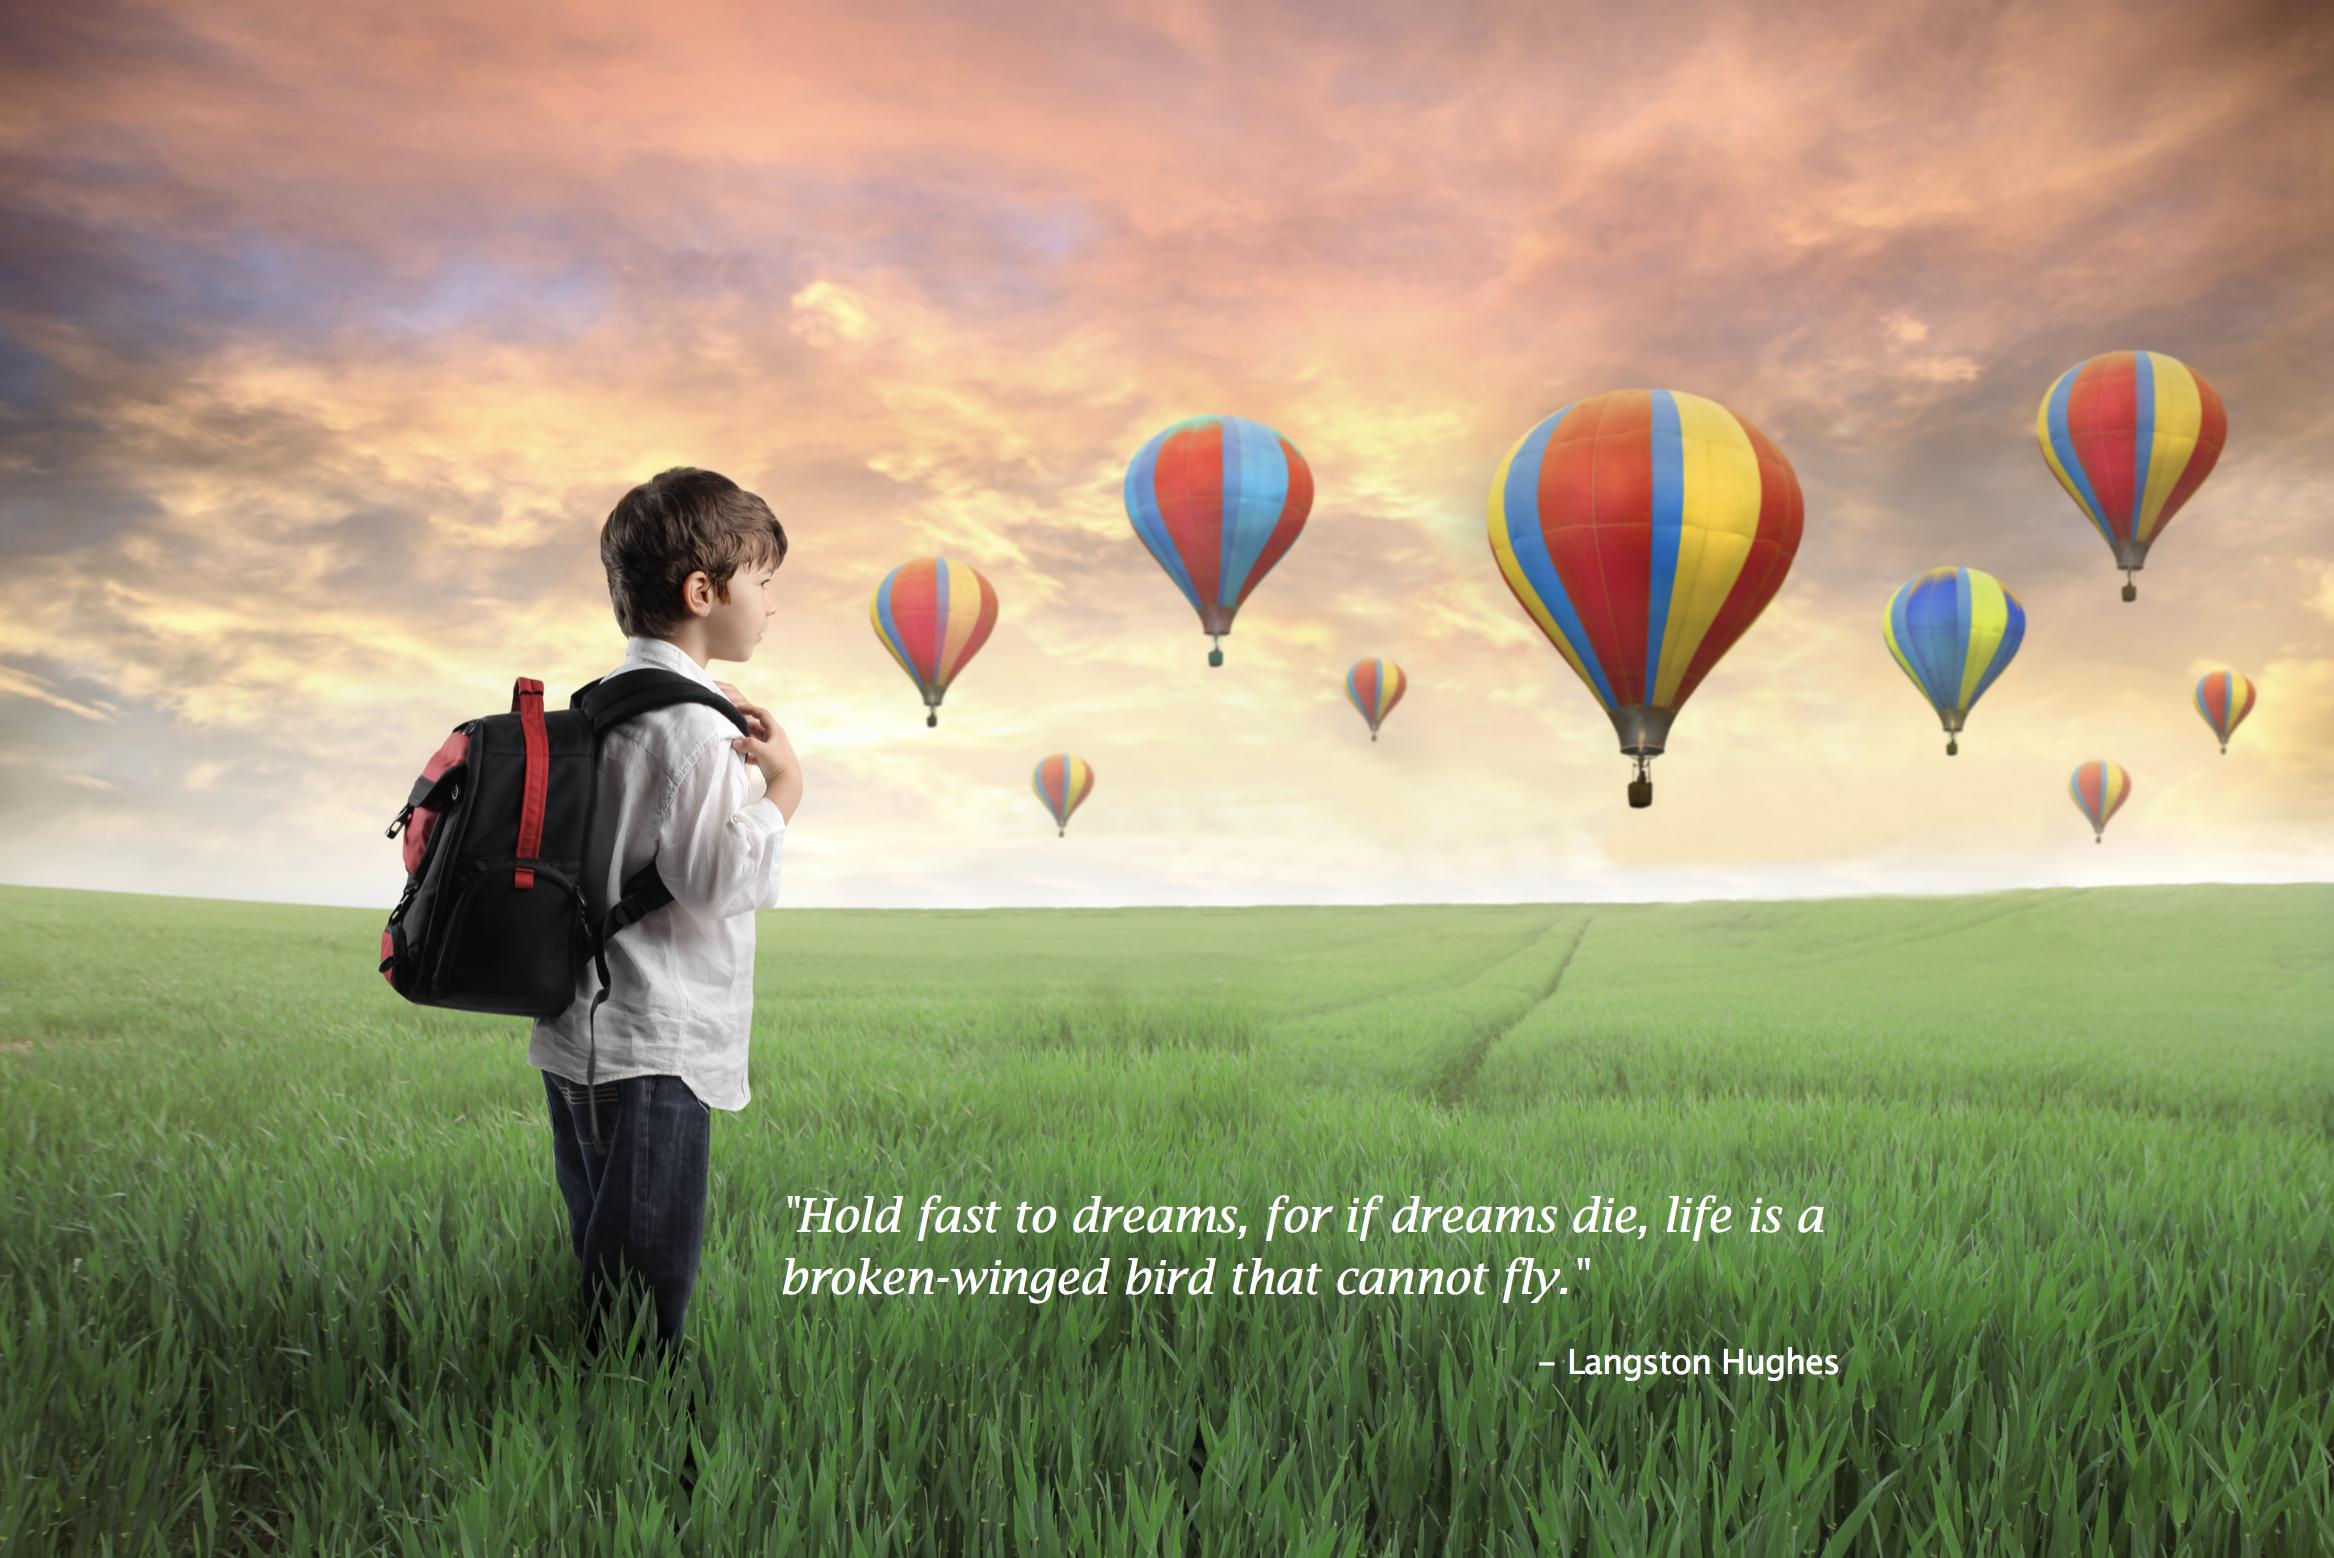 Inspiration Quotes Part 1